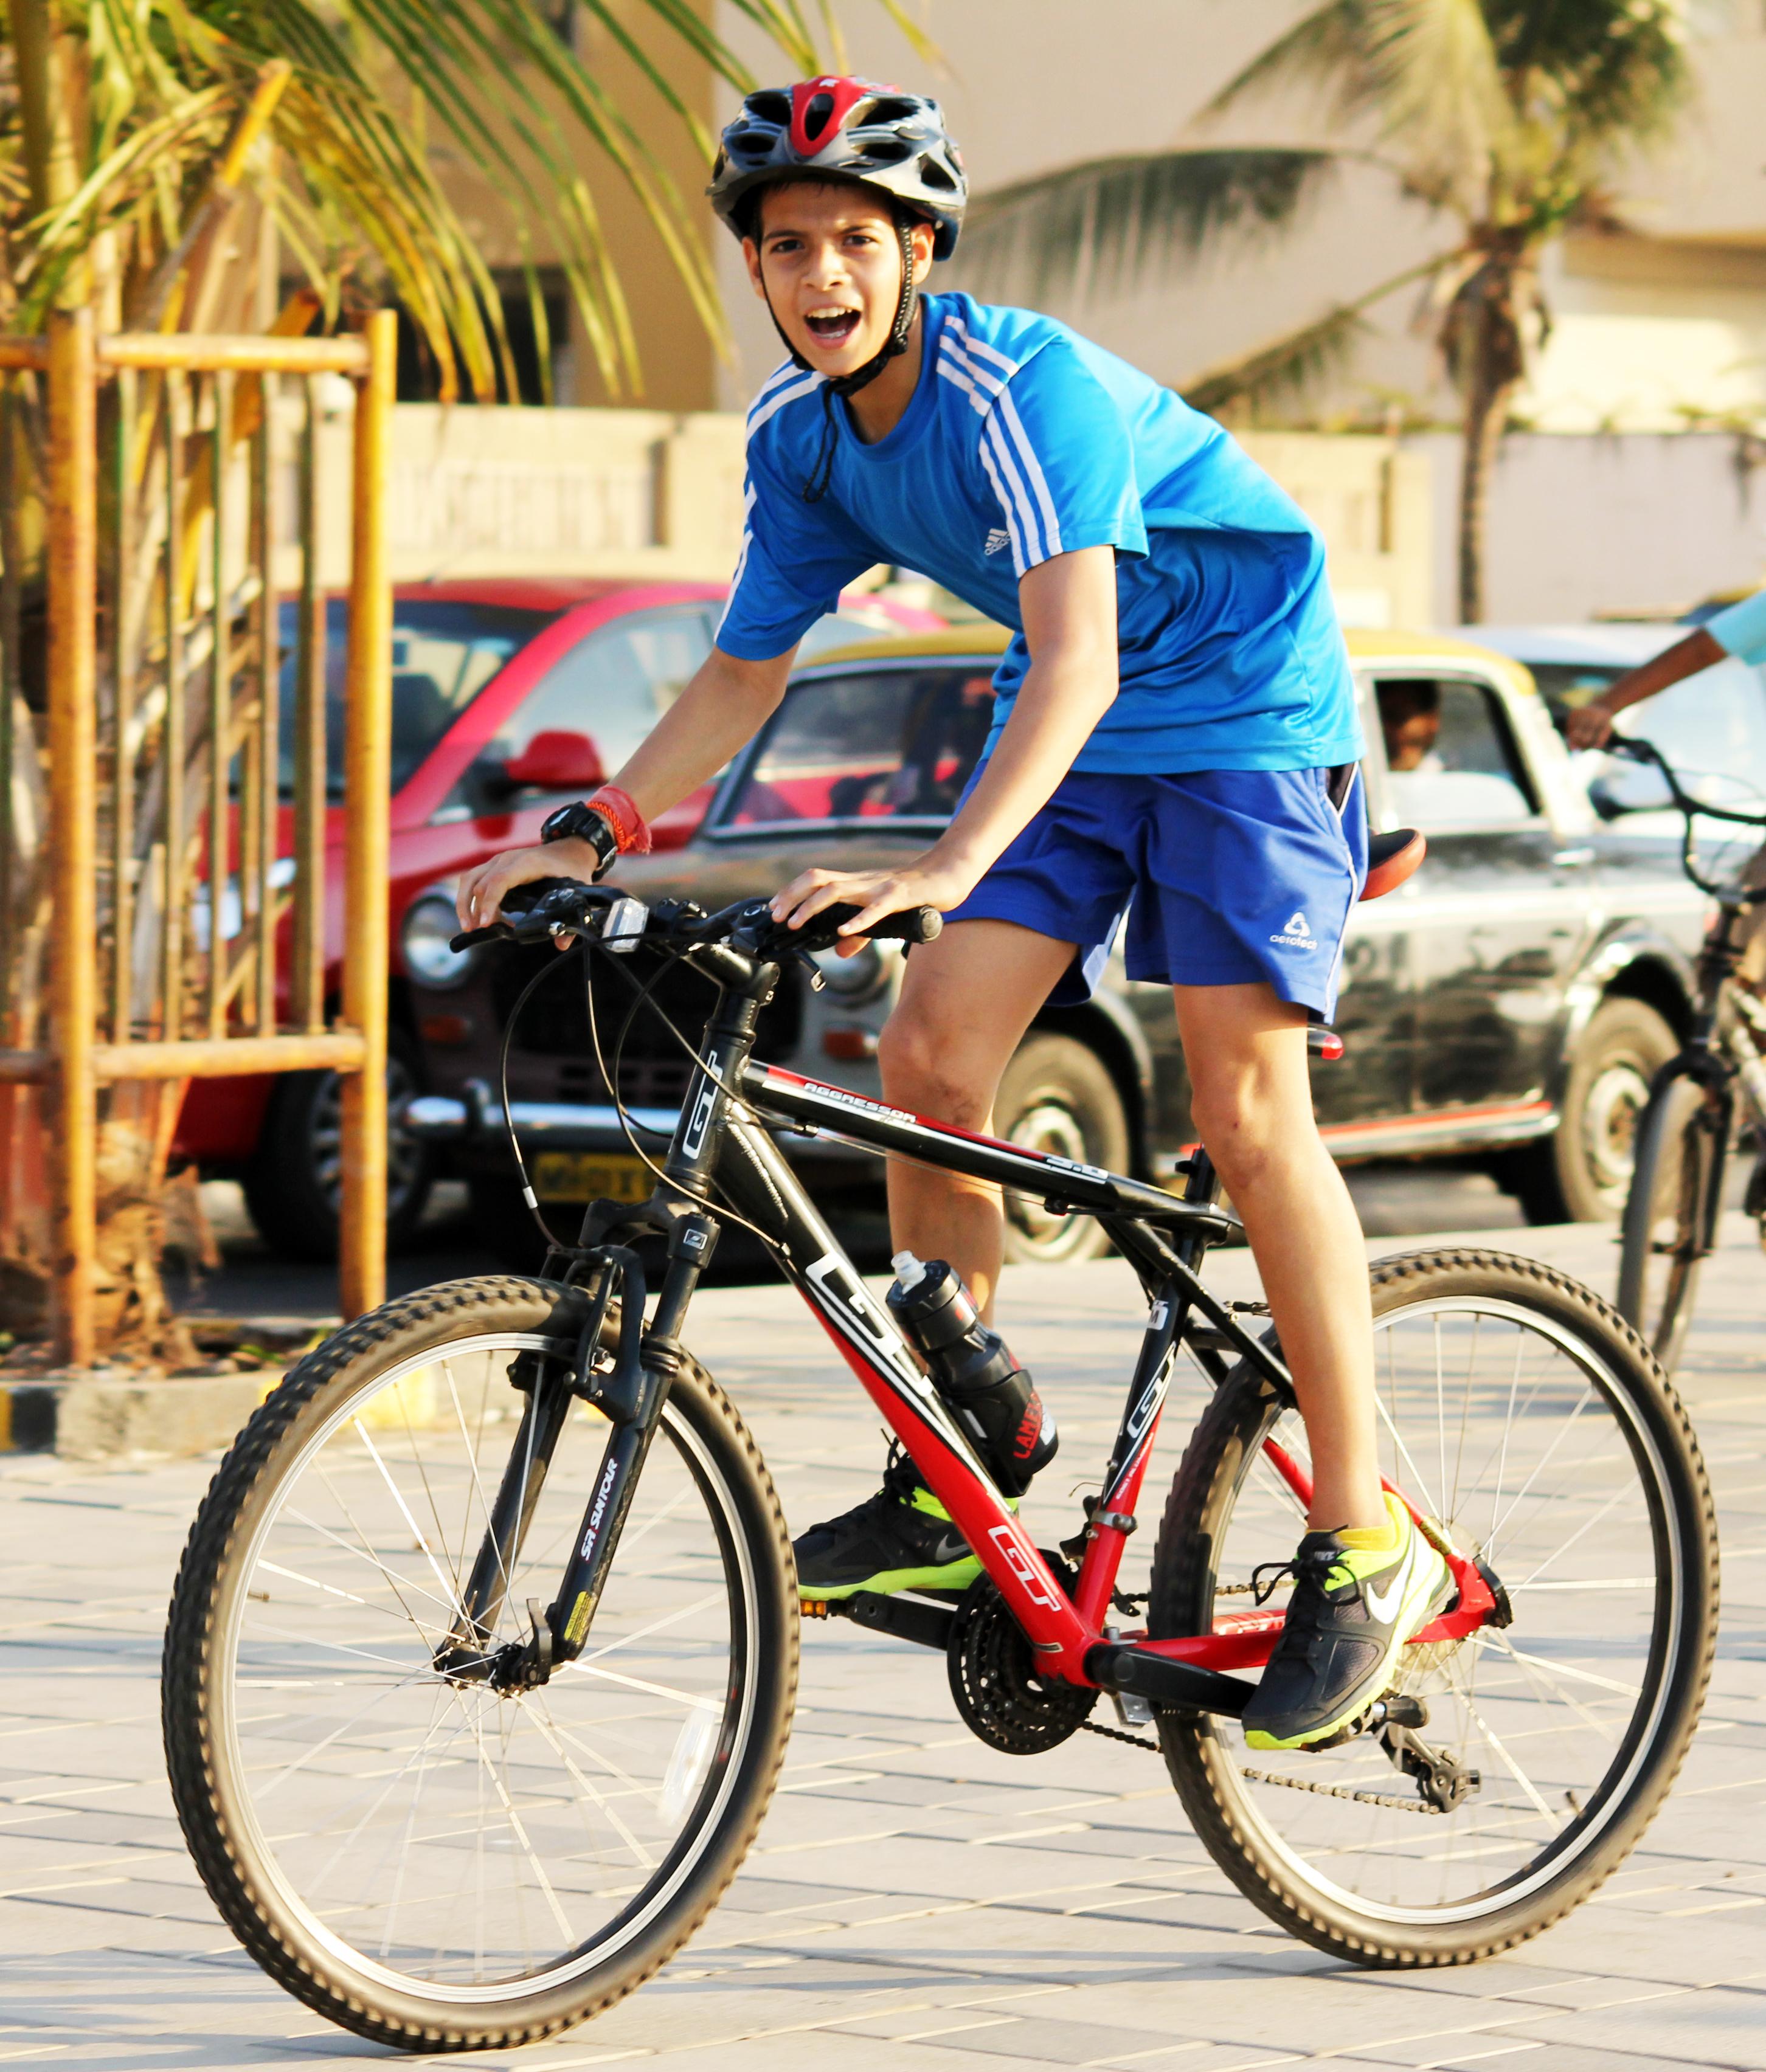 Bicycle rider photo